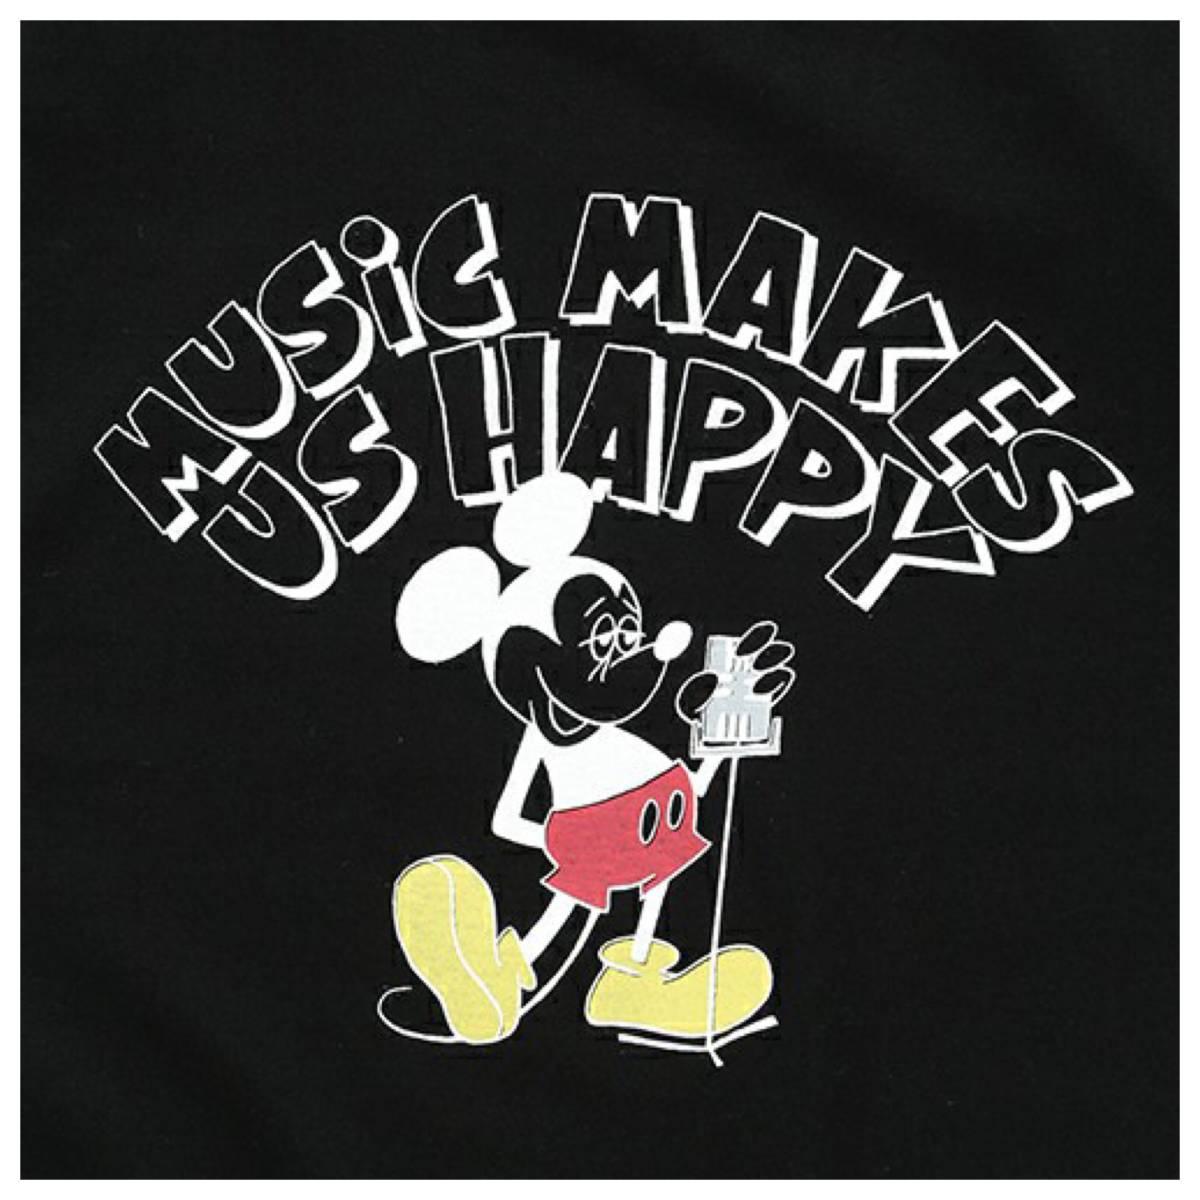 b79a058de rare FUJI ROCK FESTIVAL'17 × BEAMS / Yusuke Hanai Mickey Mouse Let It Rock! Tee  Shirts M size black *